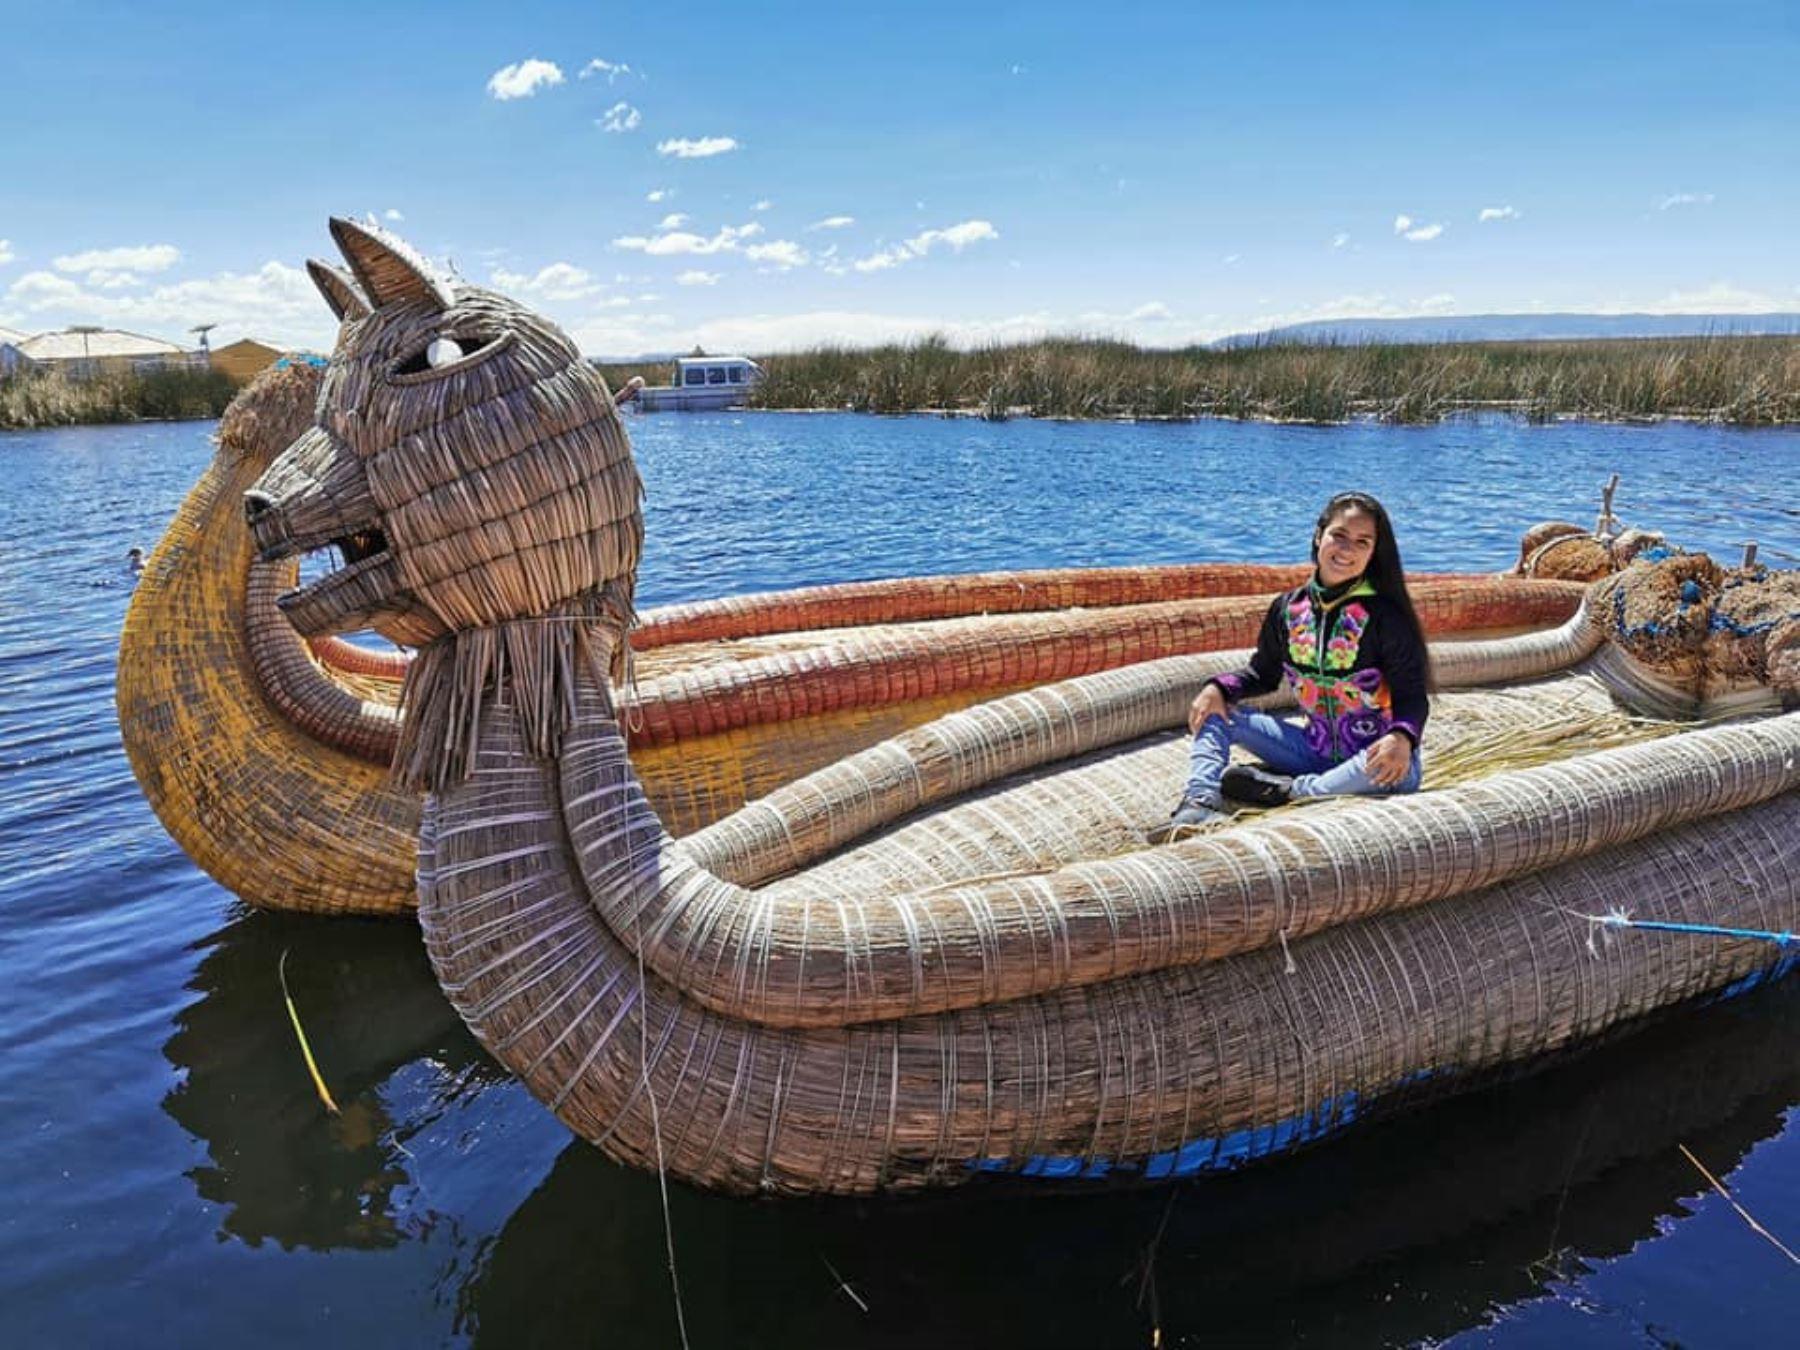 Mayella Lloclla culmina su primera semana de rodaje para Netflix en Puno.